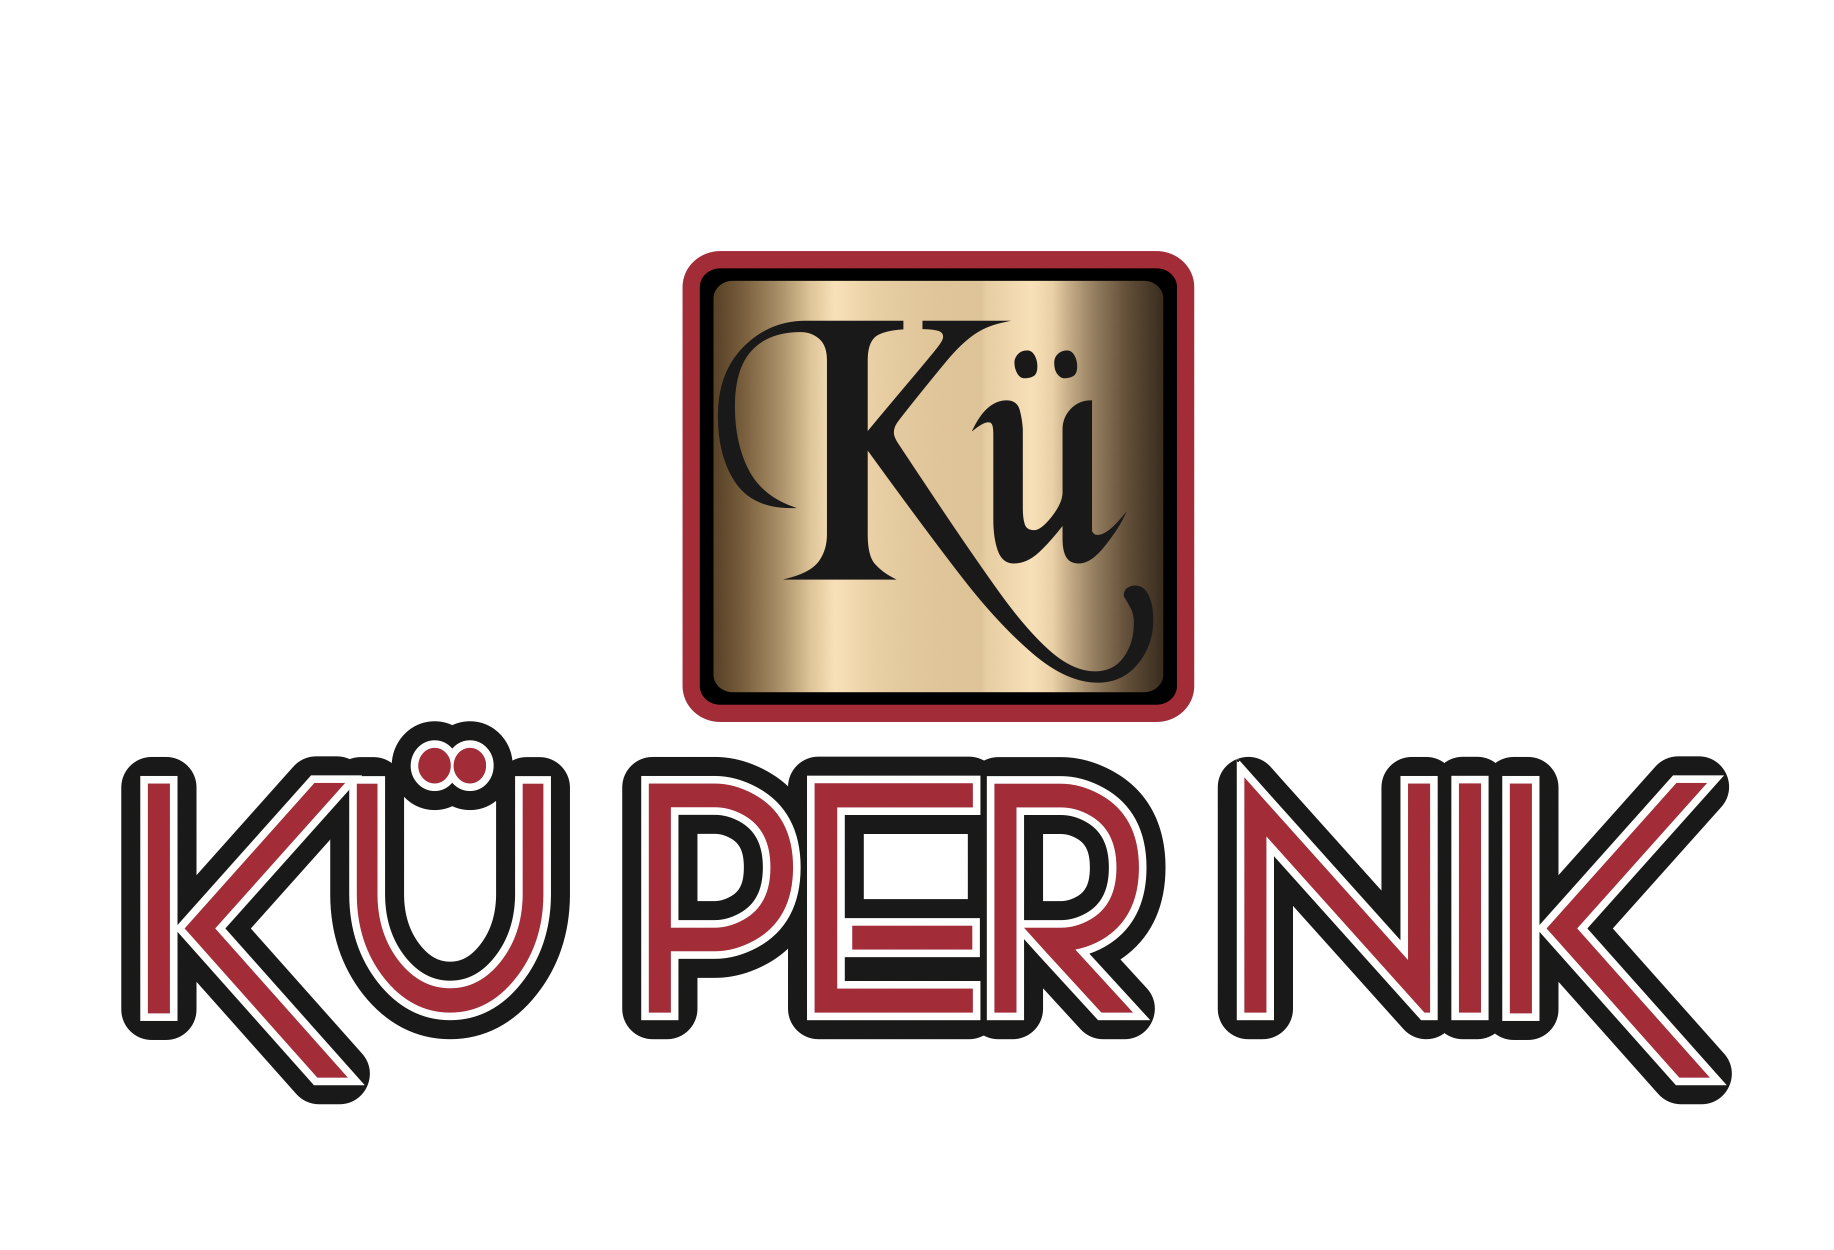 kupernik logo trans 2019-02-12 at 4